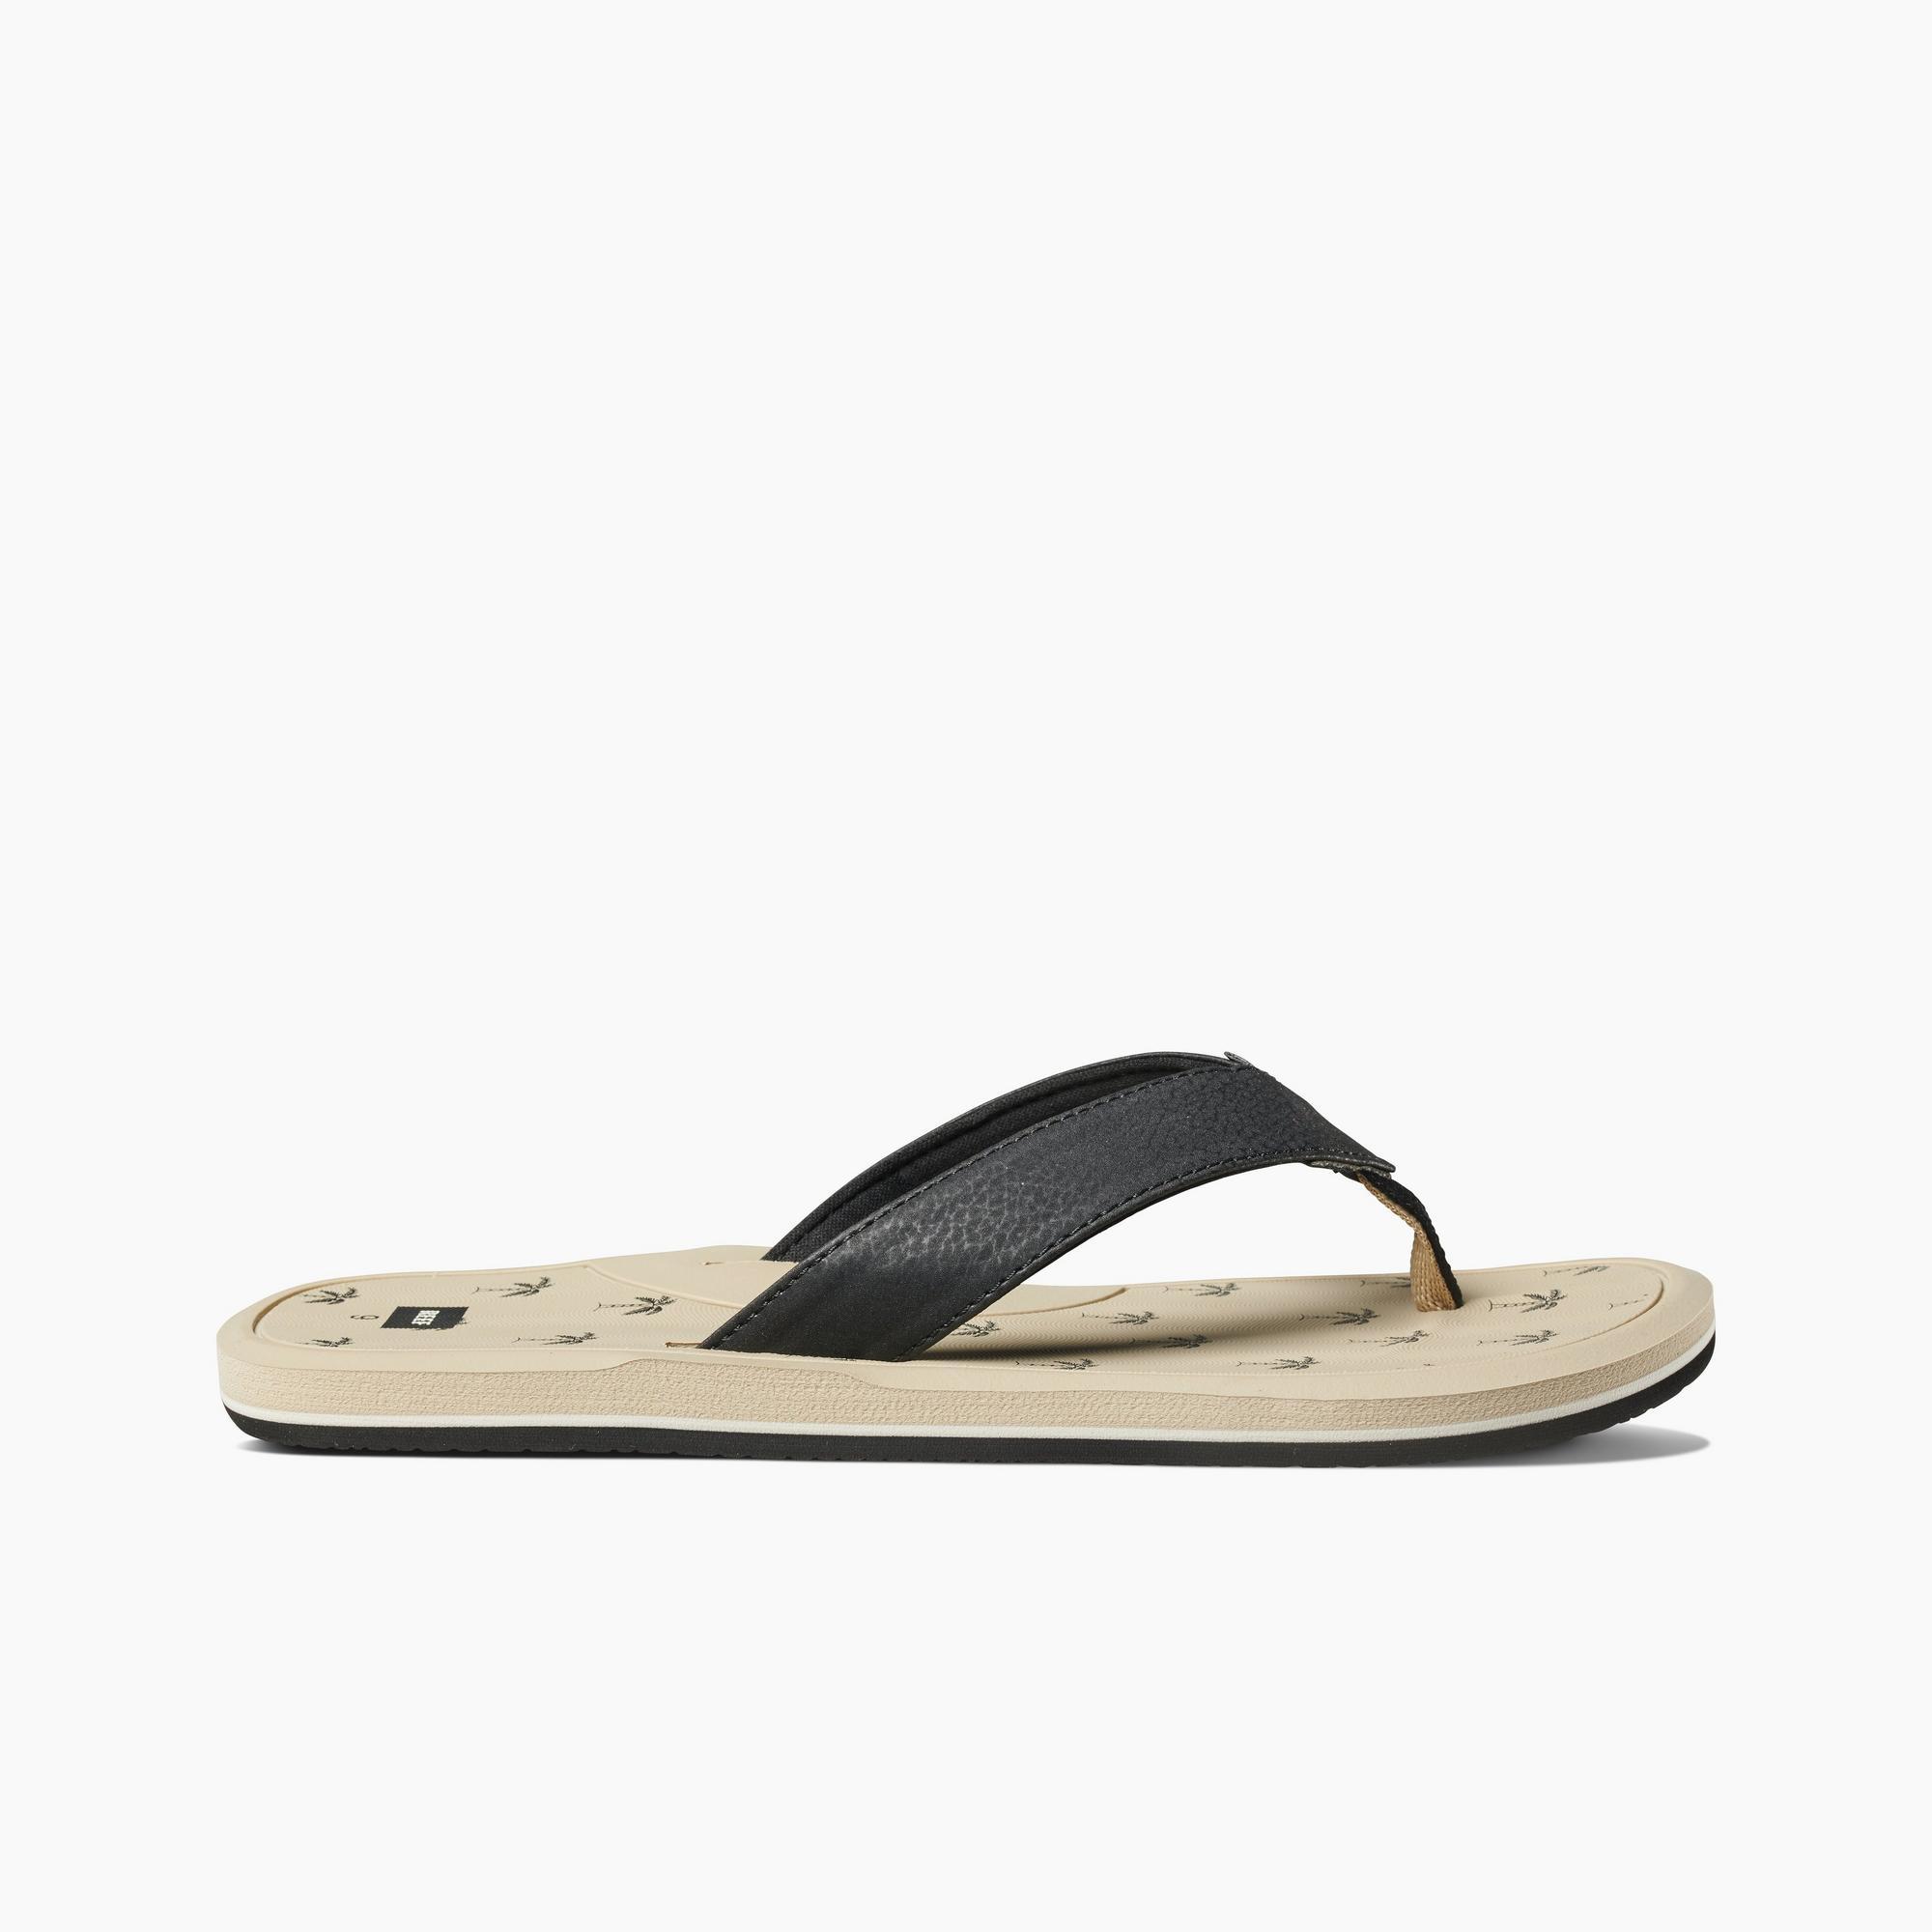 Sandales à motifs Manchado Day pour hommes - Kaki/Noir